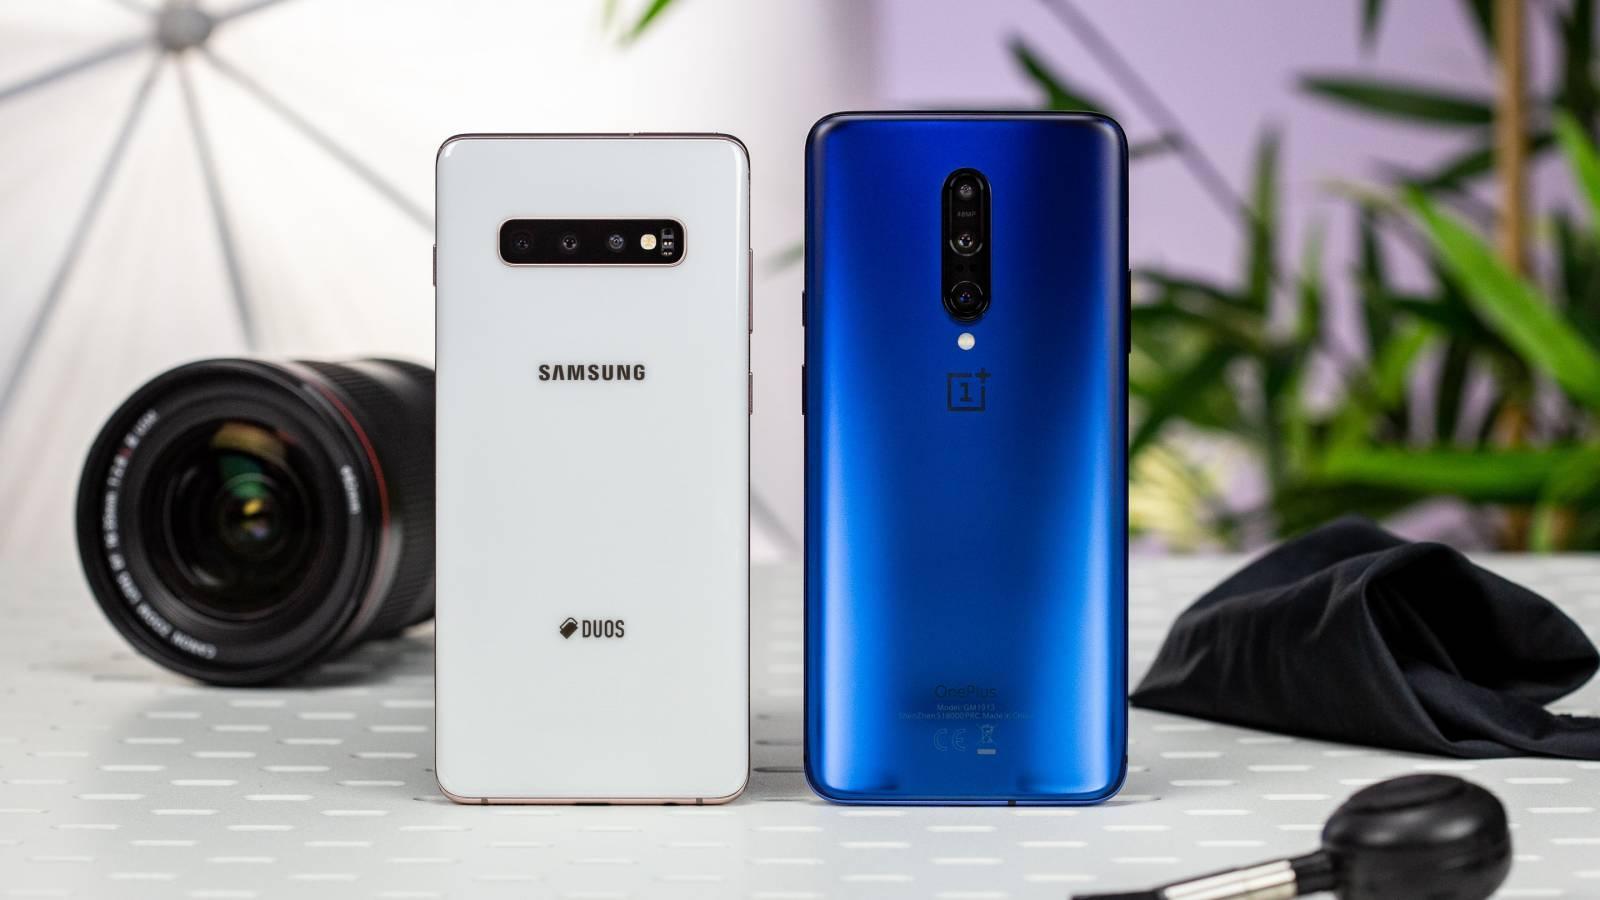 Samsung GALAXY S10 umilit OnePlus 7 PRO